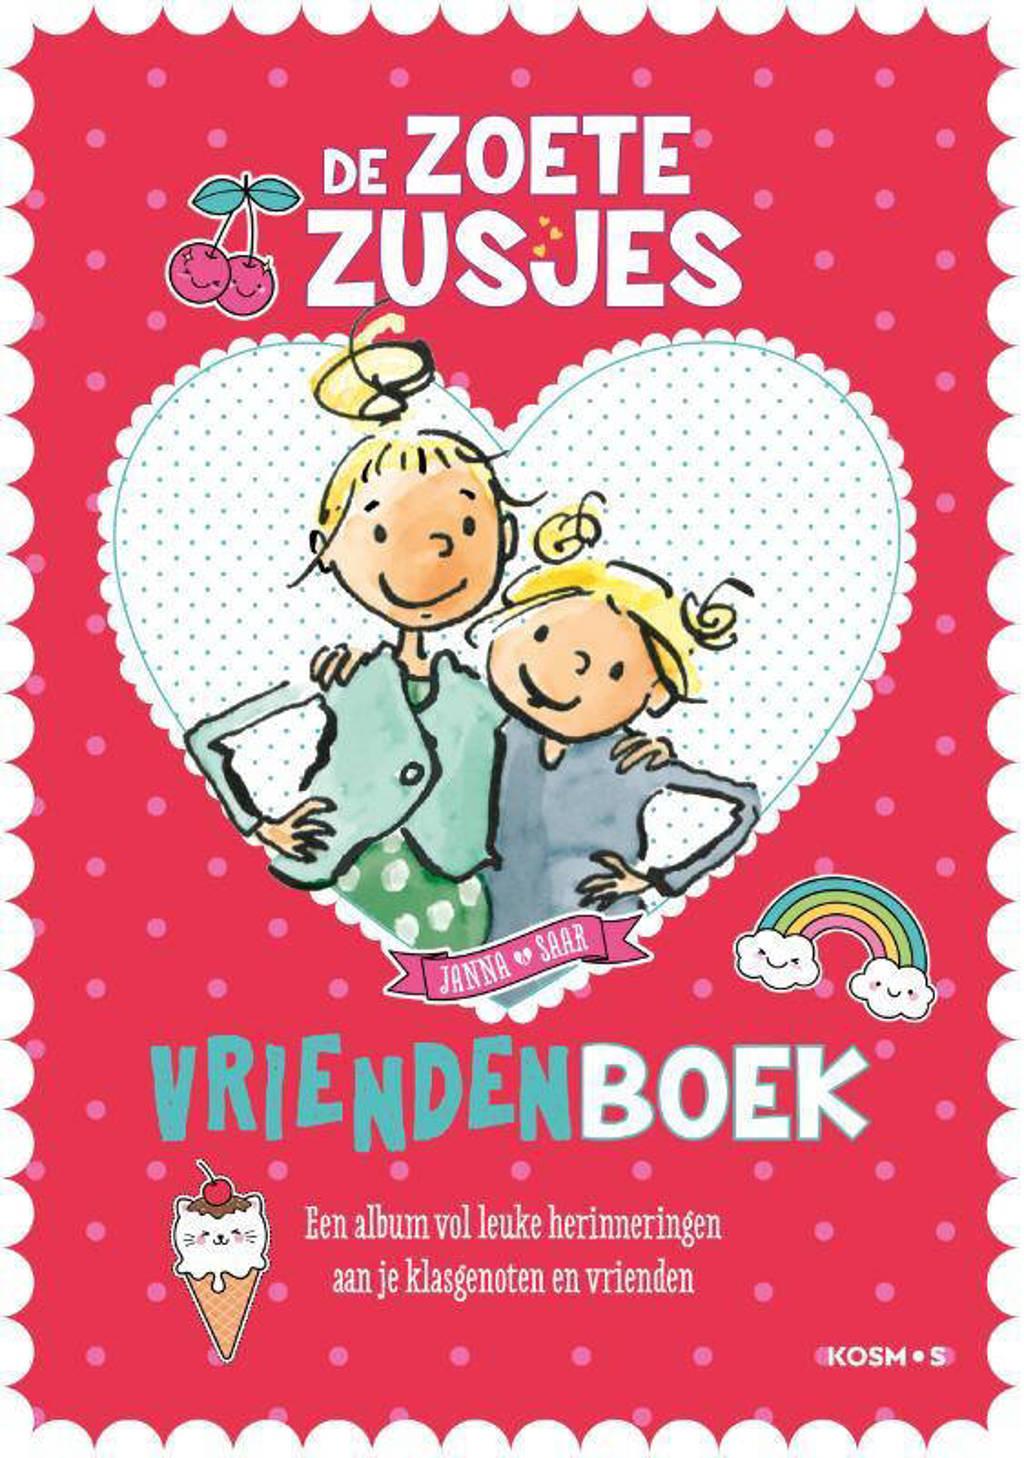 De zoete zusjes vriendenboekje - Hanneke de Zoete